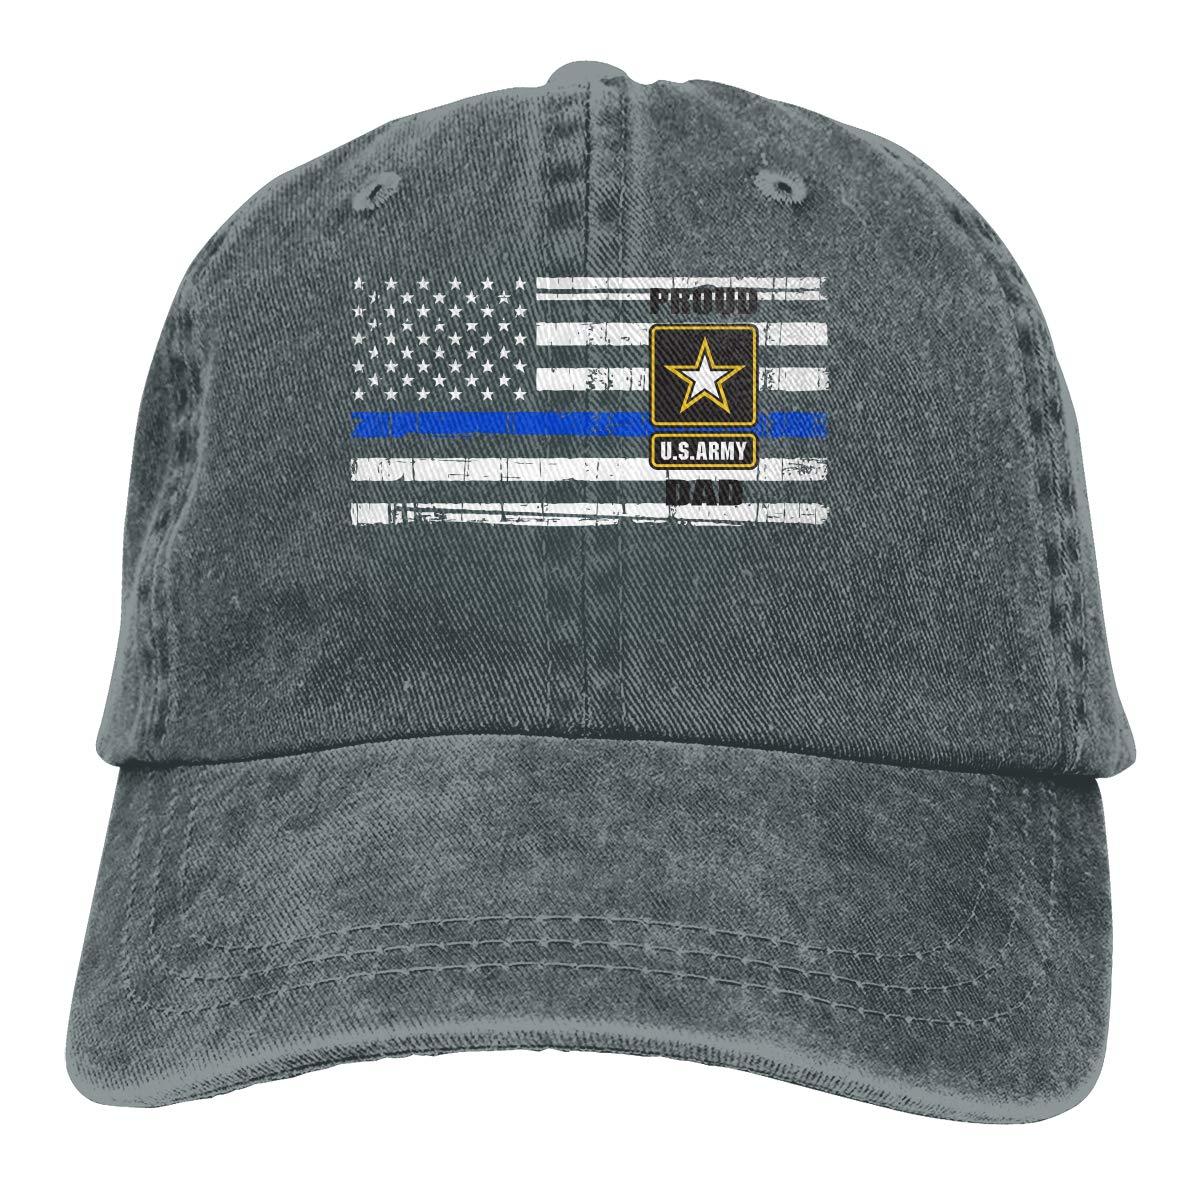 Vbfgtg Proud Army Dad Thin Blue Line Flag Denim Hats Washed Retro Baseball Cap  Dad Hat at Amazon Men s Clothing store  9ea5226032e